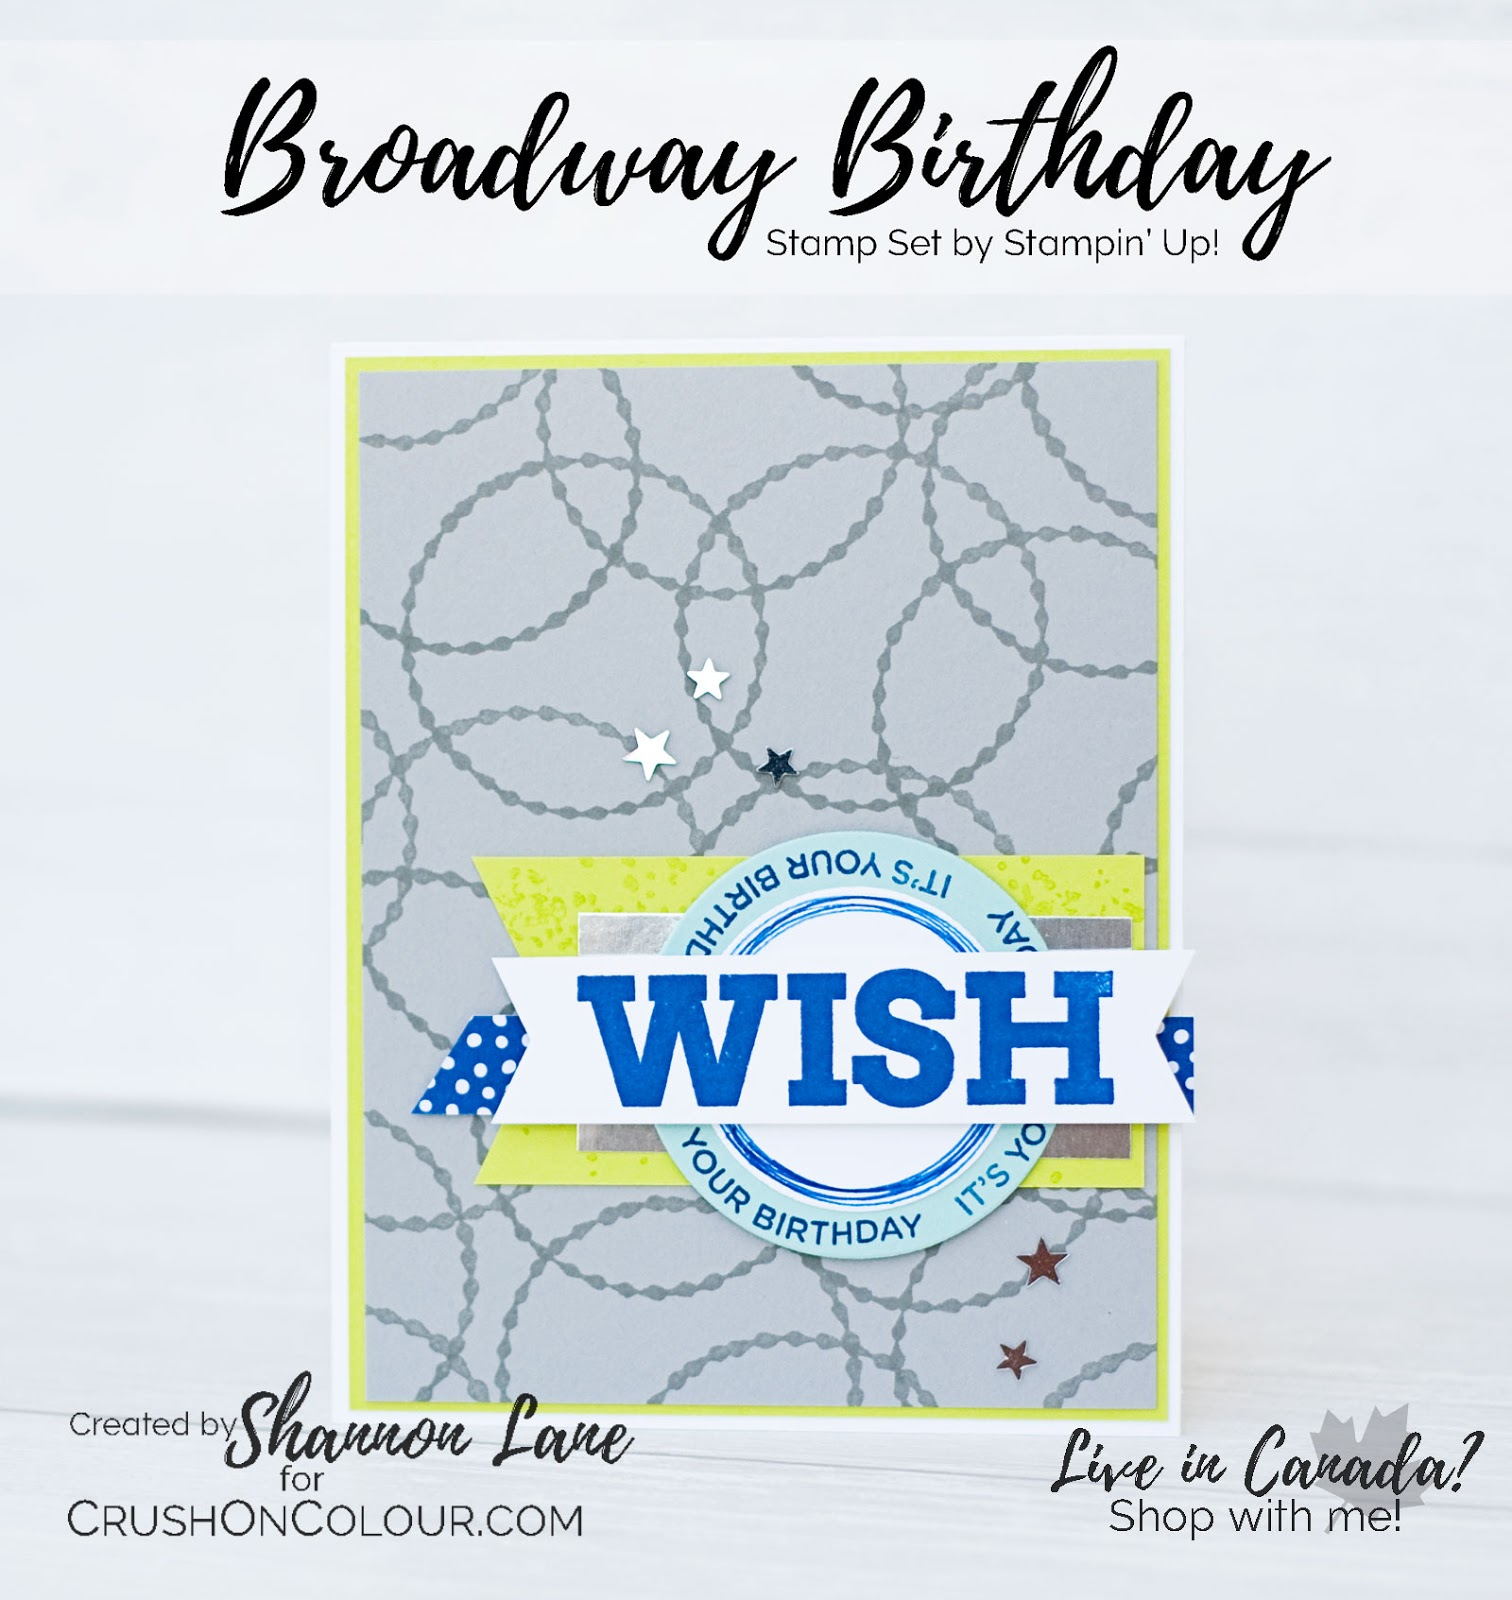 Crush On Colour: WISH - Broadway Birthday